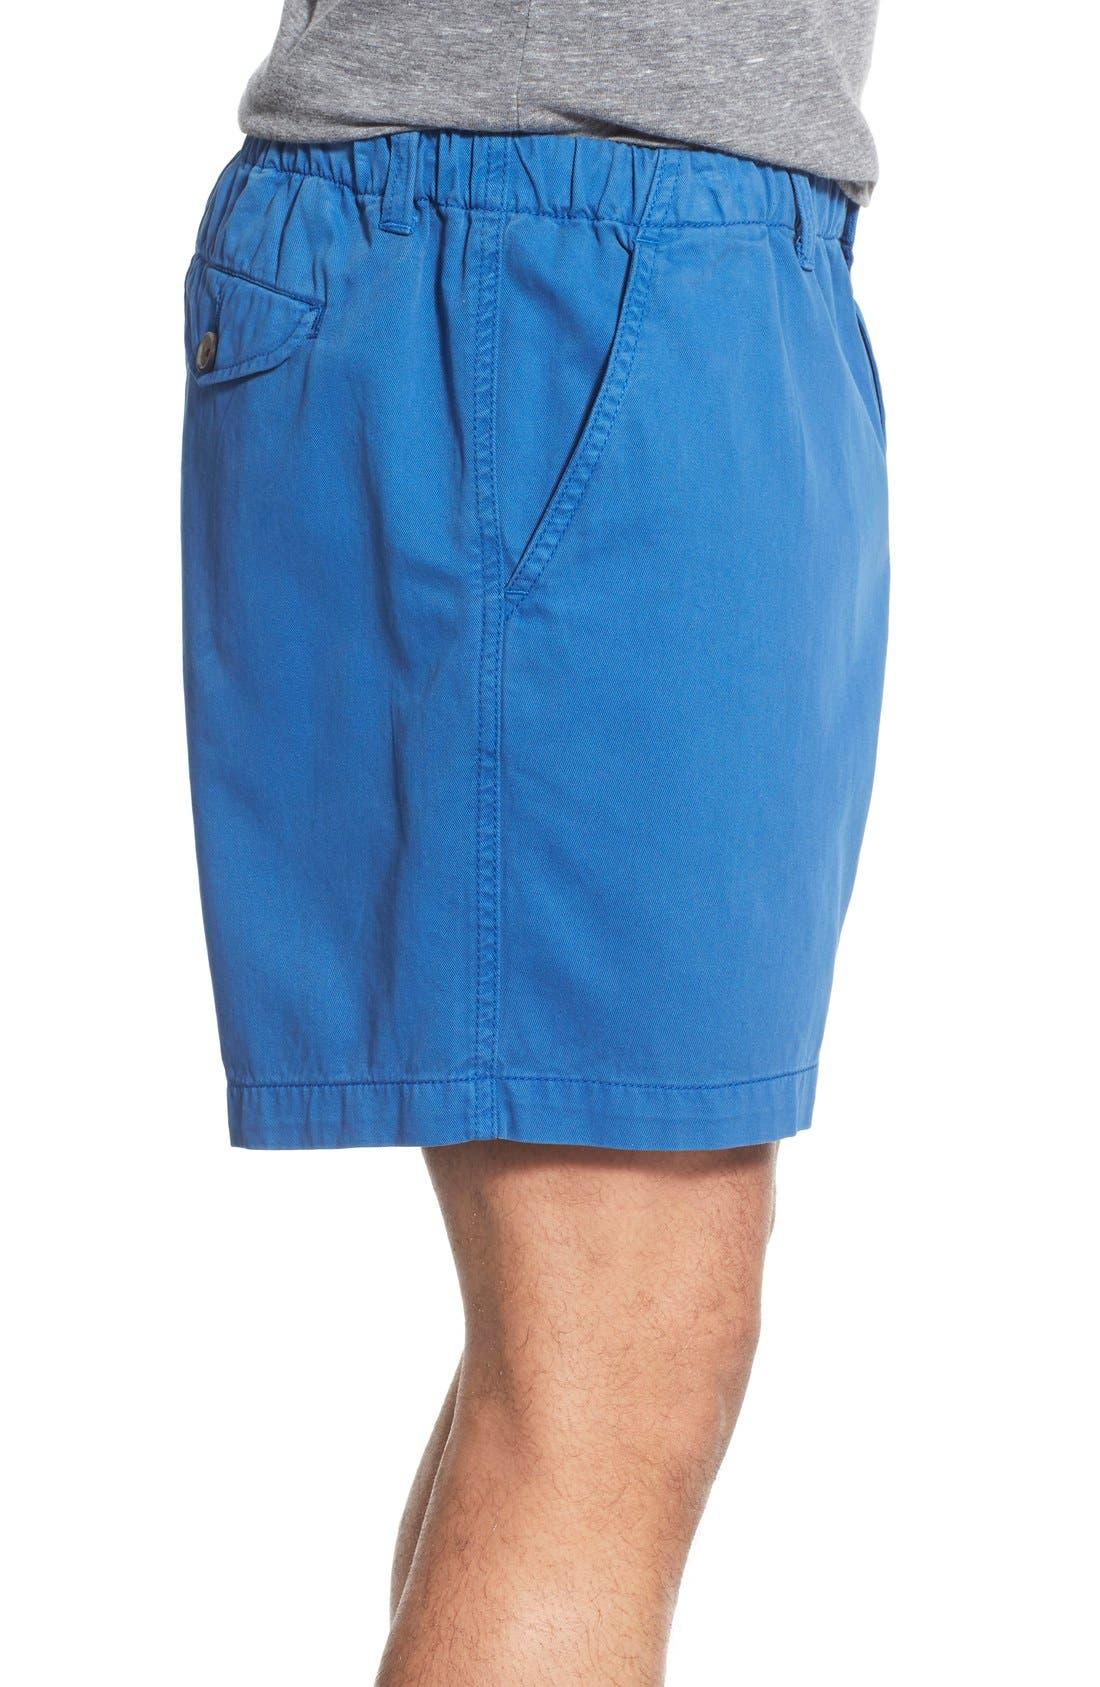 Alternate Image 3  - Vintage 1946 'Snappers' Vintage Washed Elastic Waistband Shorts